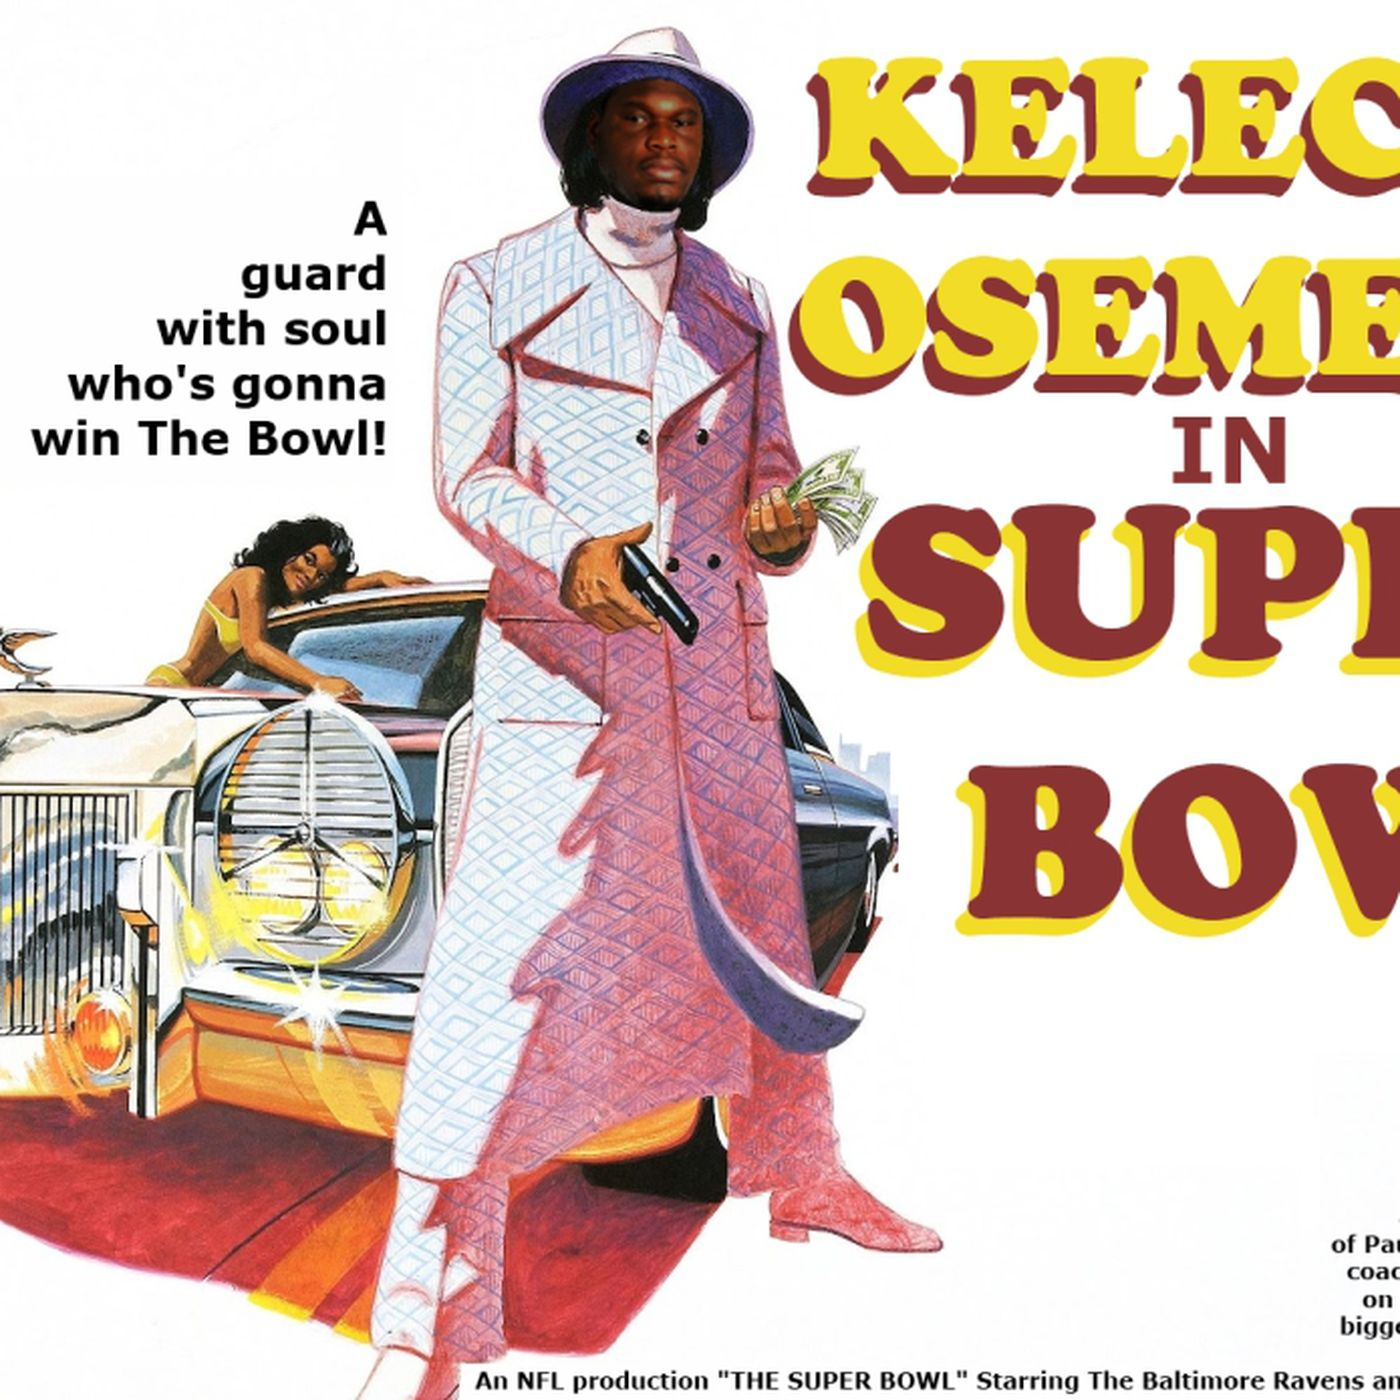 Kelechi Osemele In Super Bowl Wide Right Natty Lite